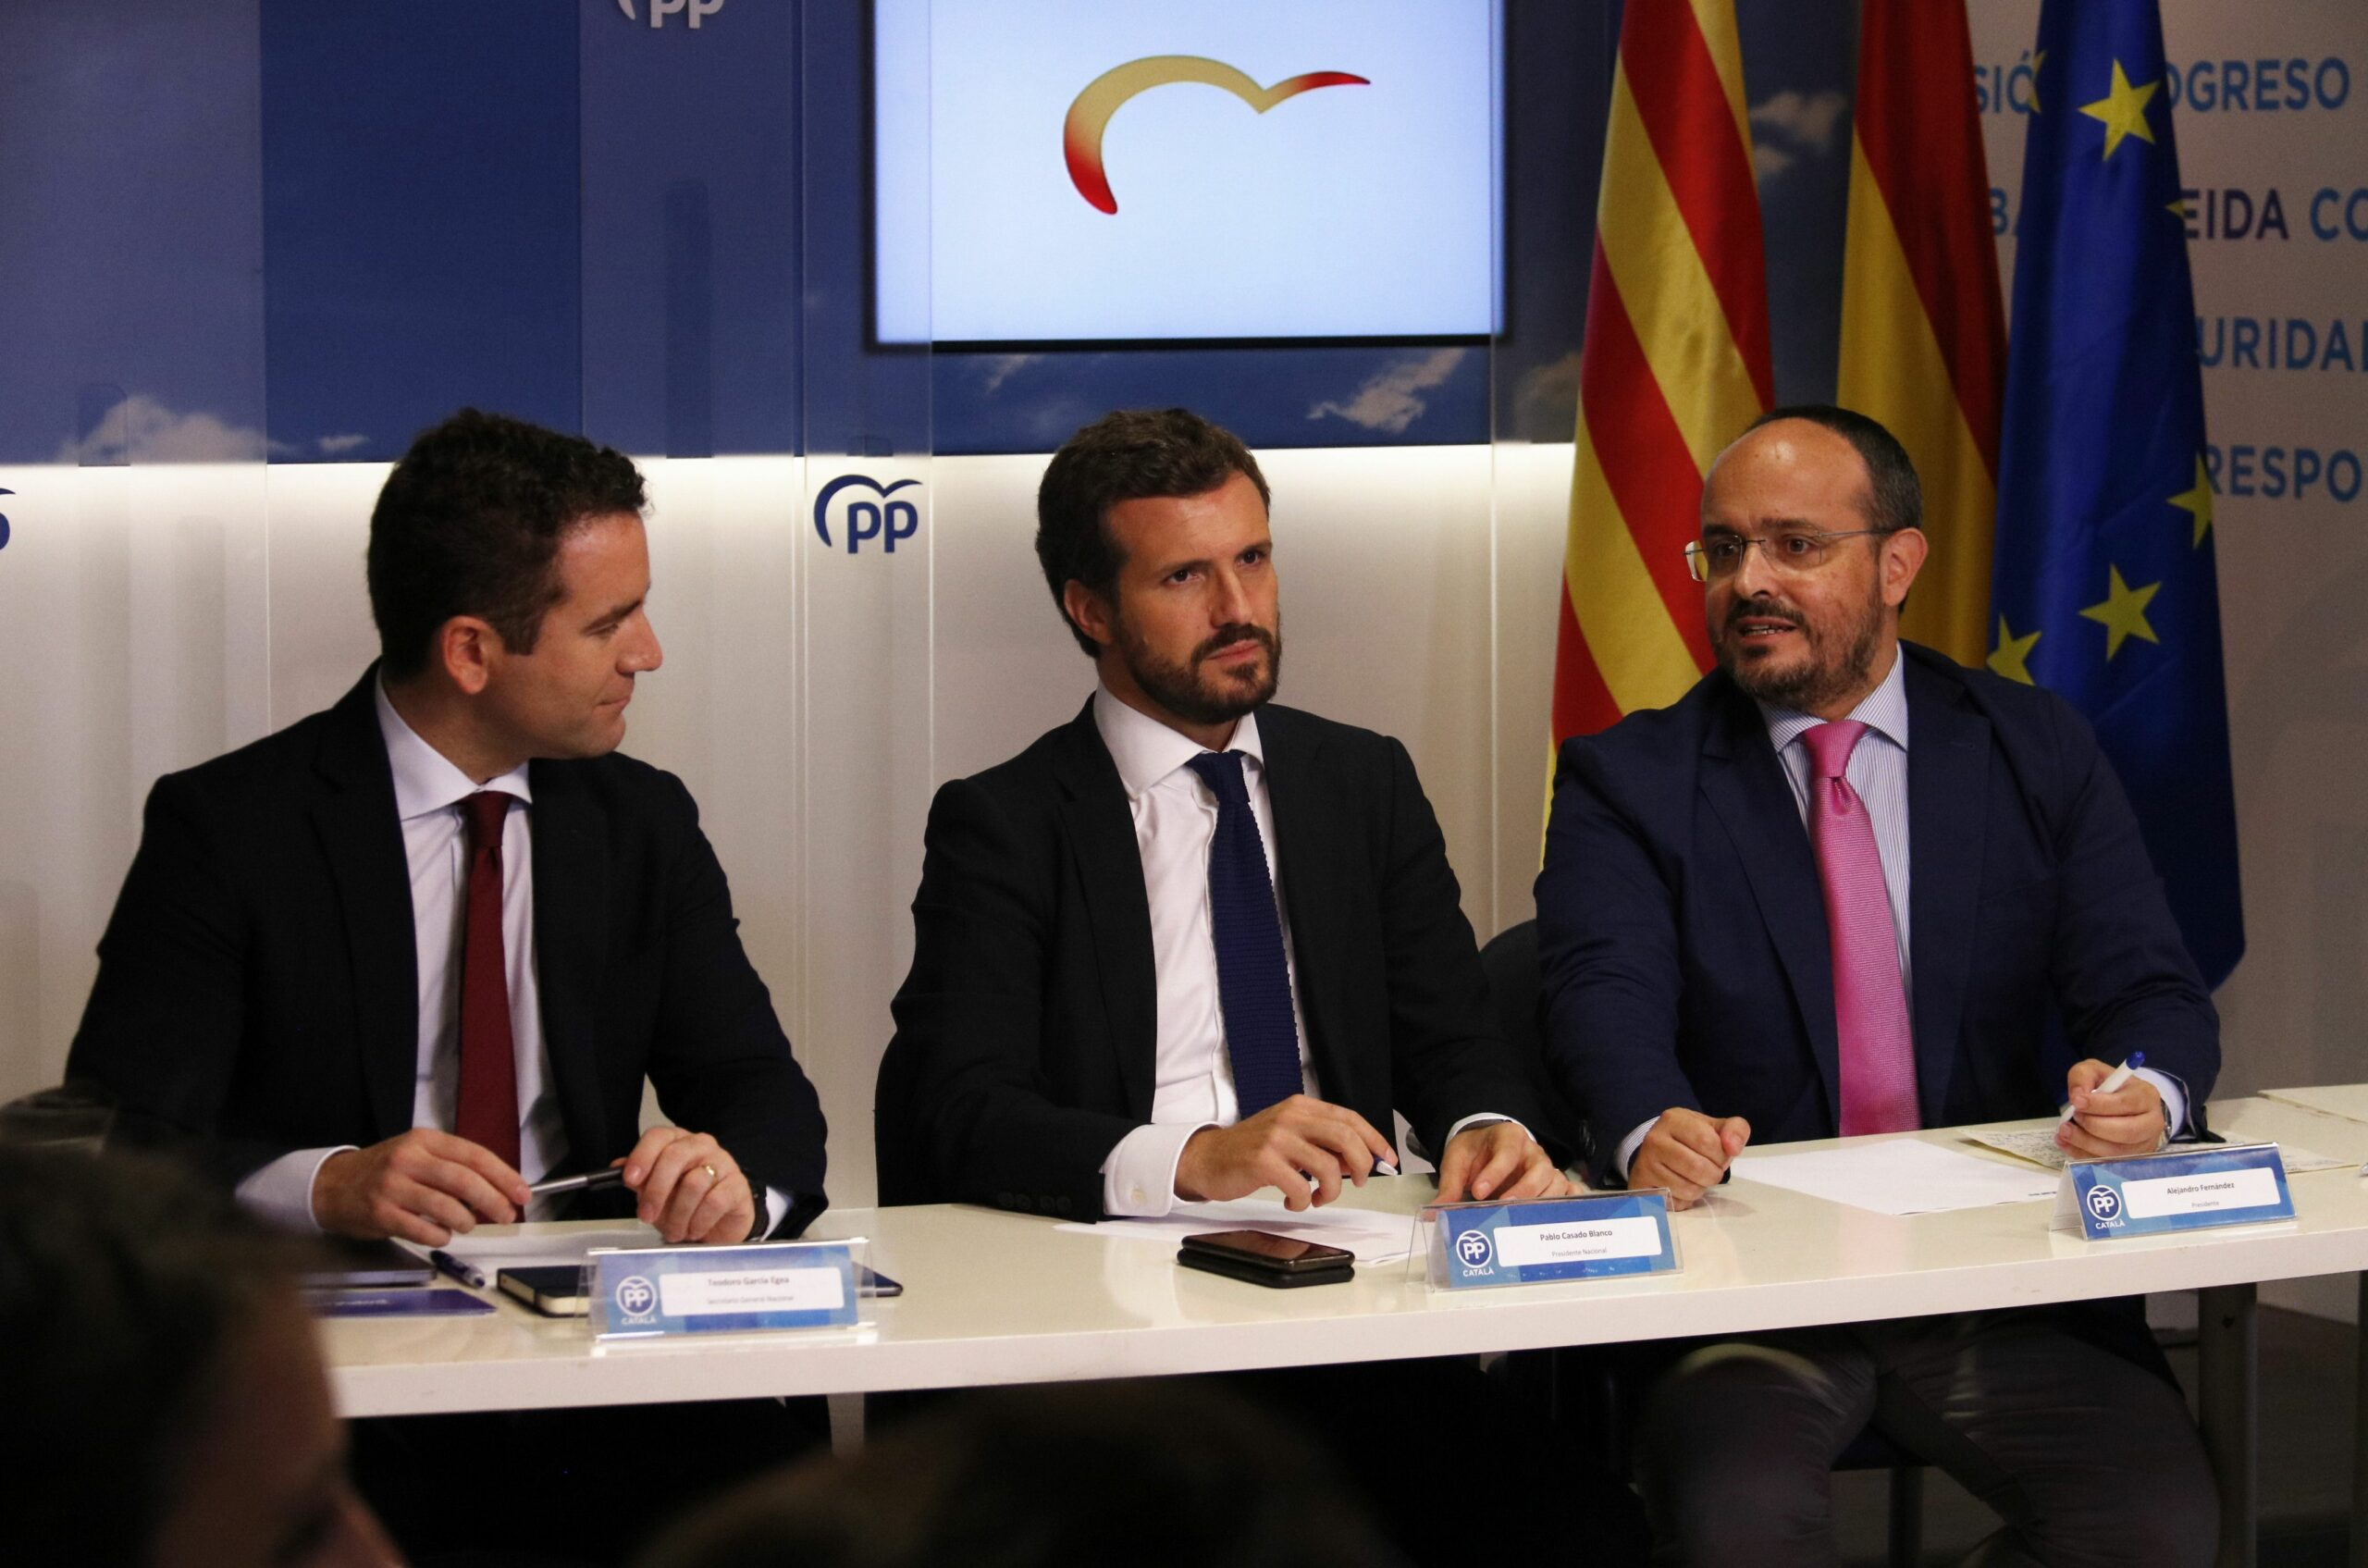 Teodoro García Egea, Pablo Casado i Alejandro Fernández, en la reunió de la dirección del PP d'aquest mató a Barcelona